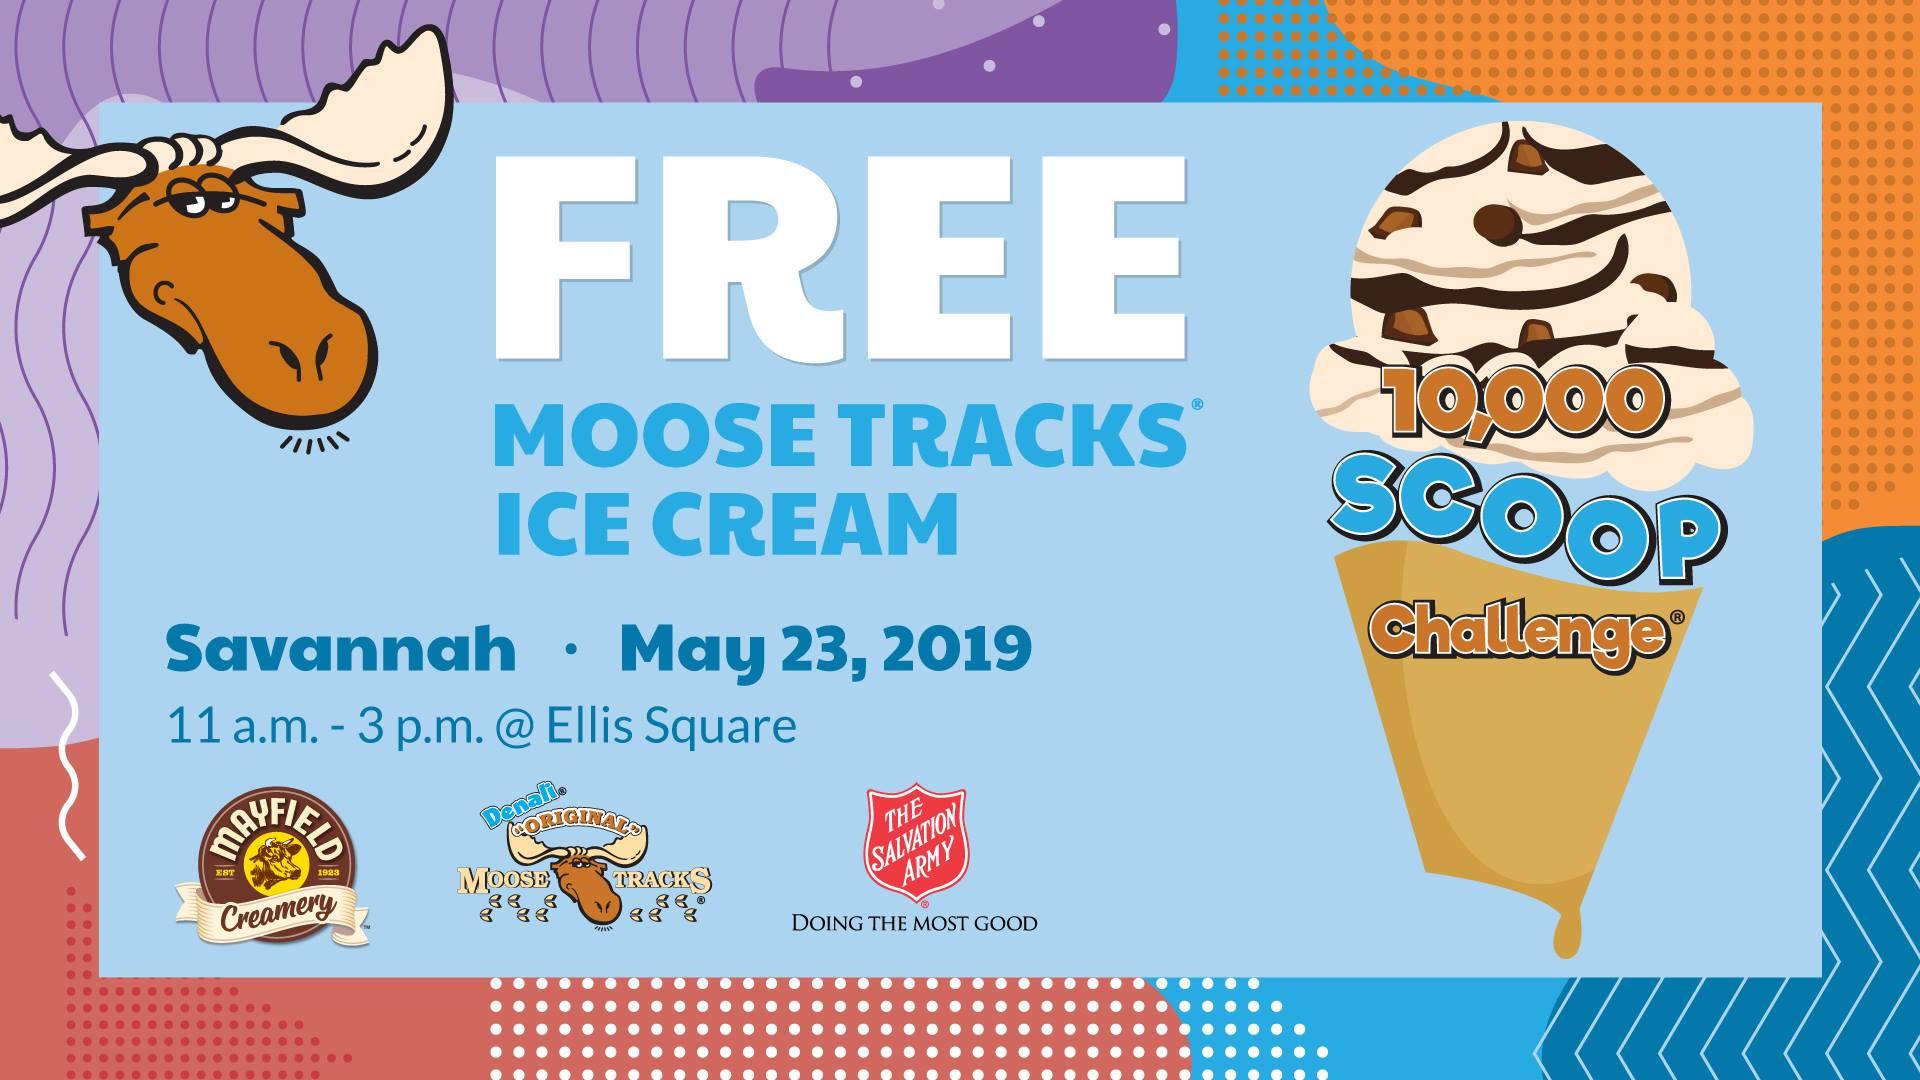 Free ice cream May 2019 Ellis Square Savannah 10,000 scoop challenge